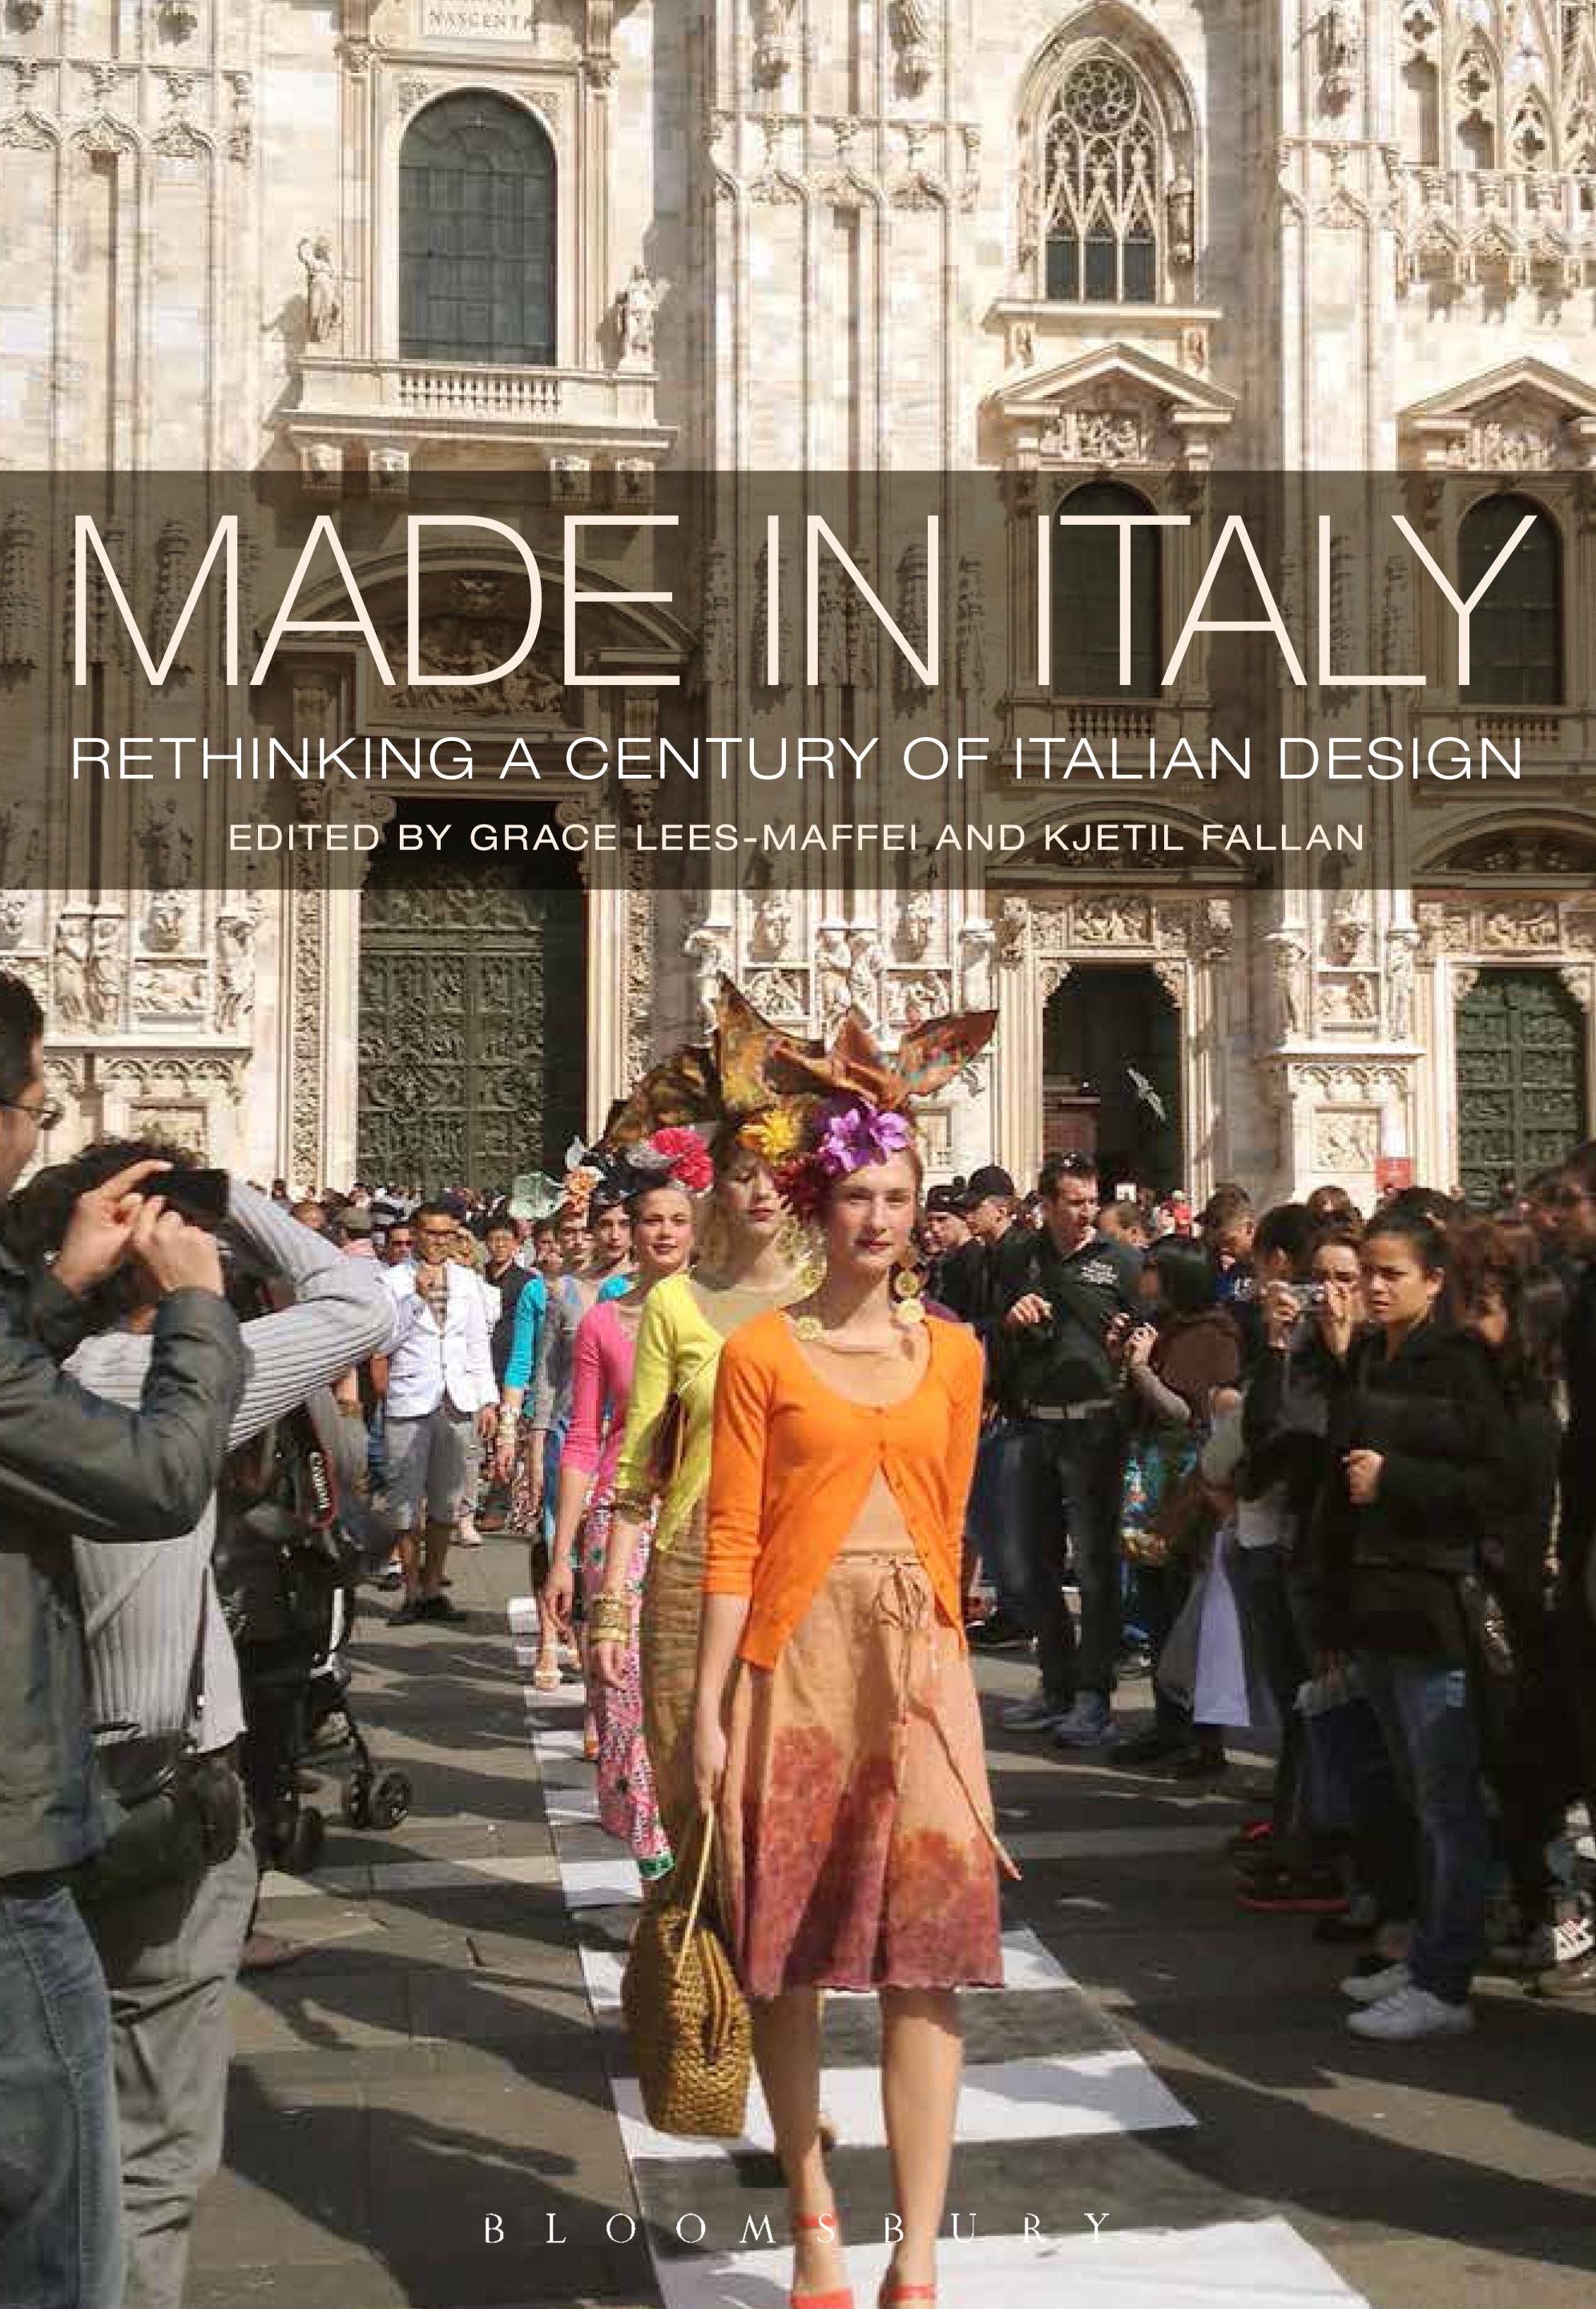 Made in Italy - Rethinking a Century of Italian Design. Edited by Grace Lees-Maffei and Kjetil Fallan. London: Bloomsbury Academic, 2014.